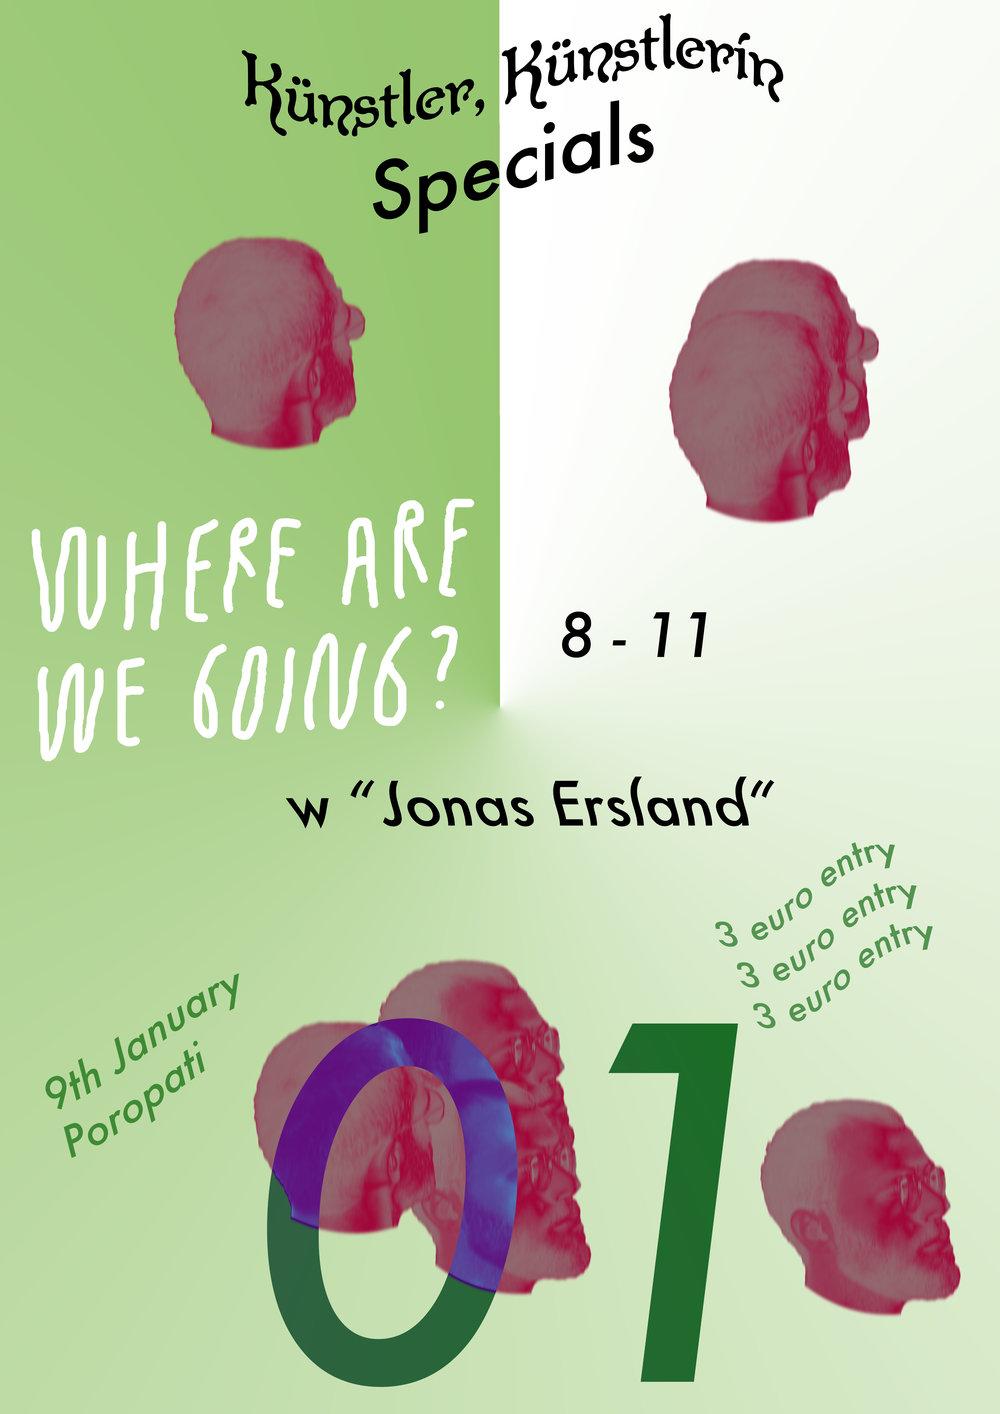 Kunstler, kunstlerin specials, 01 with Jonas Ersland.jpg